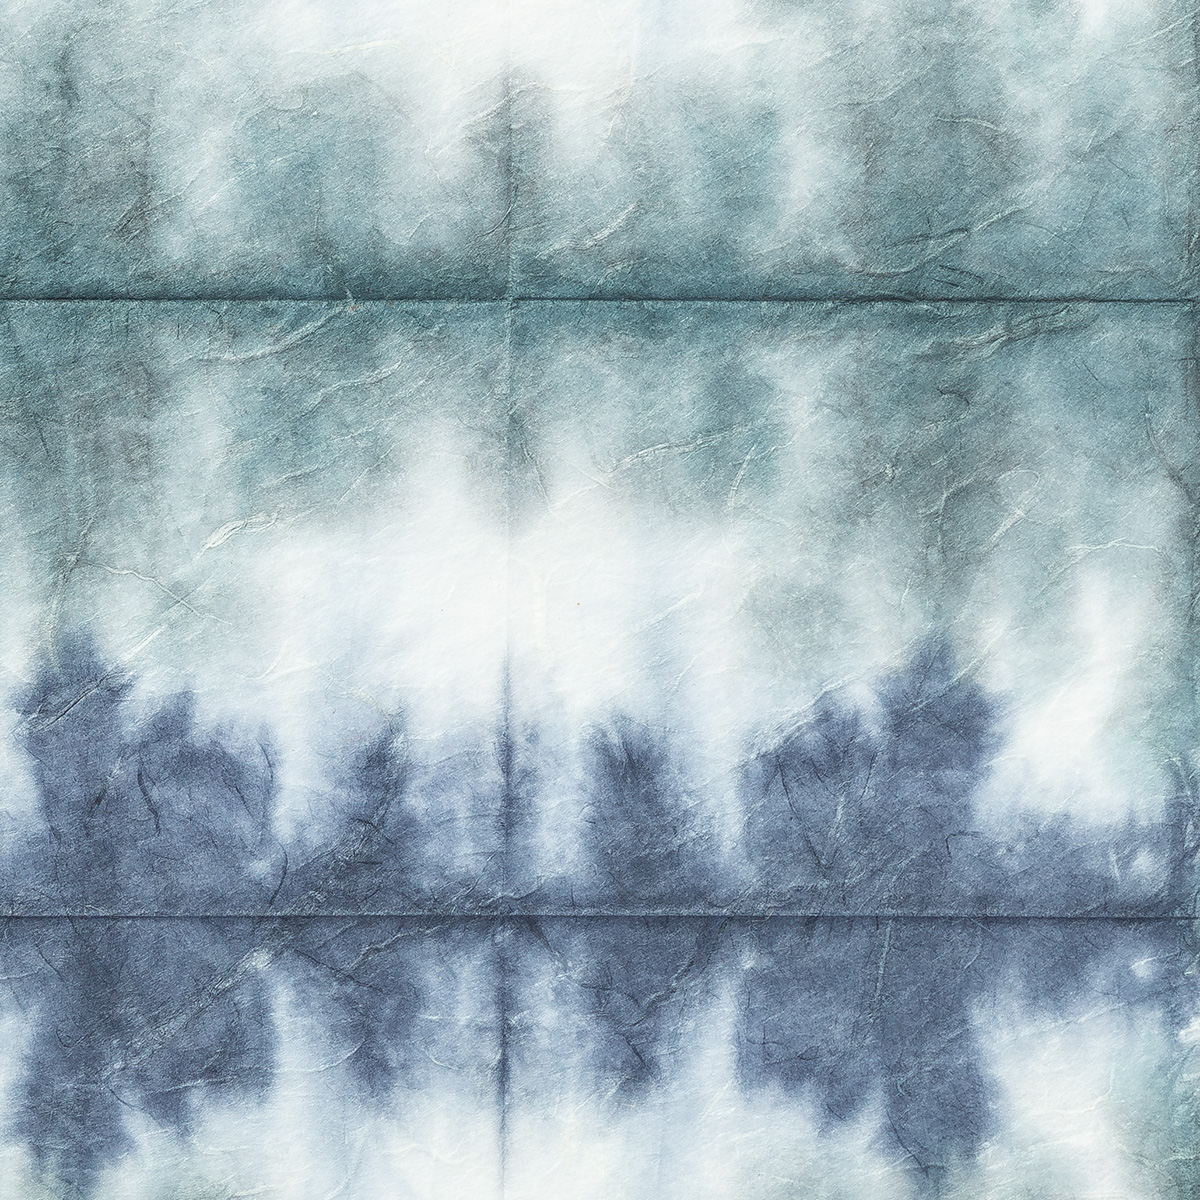 楮6匁 雲竜紙 板締め No.30